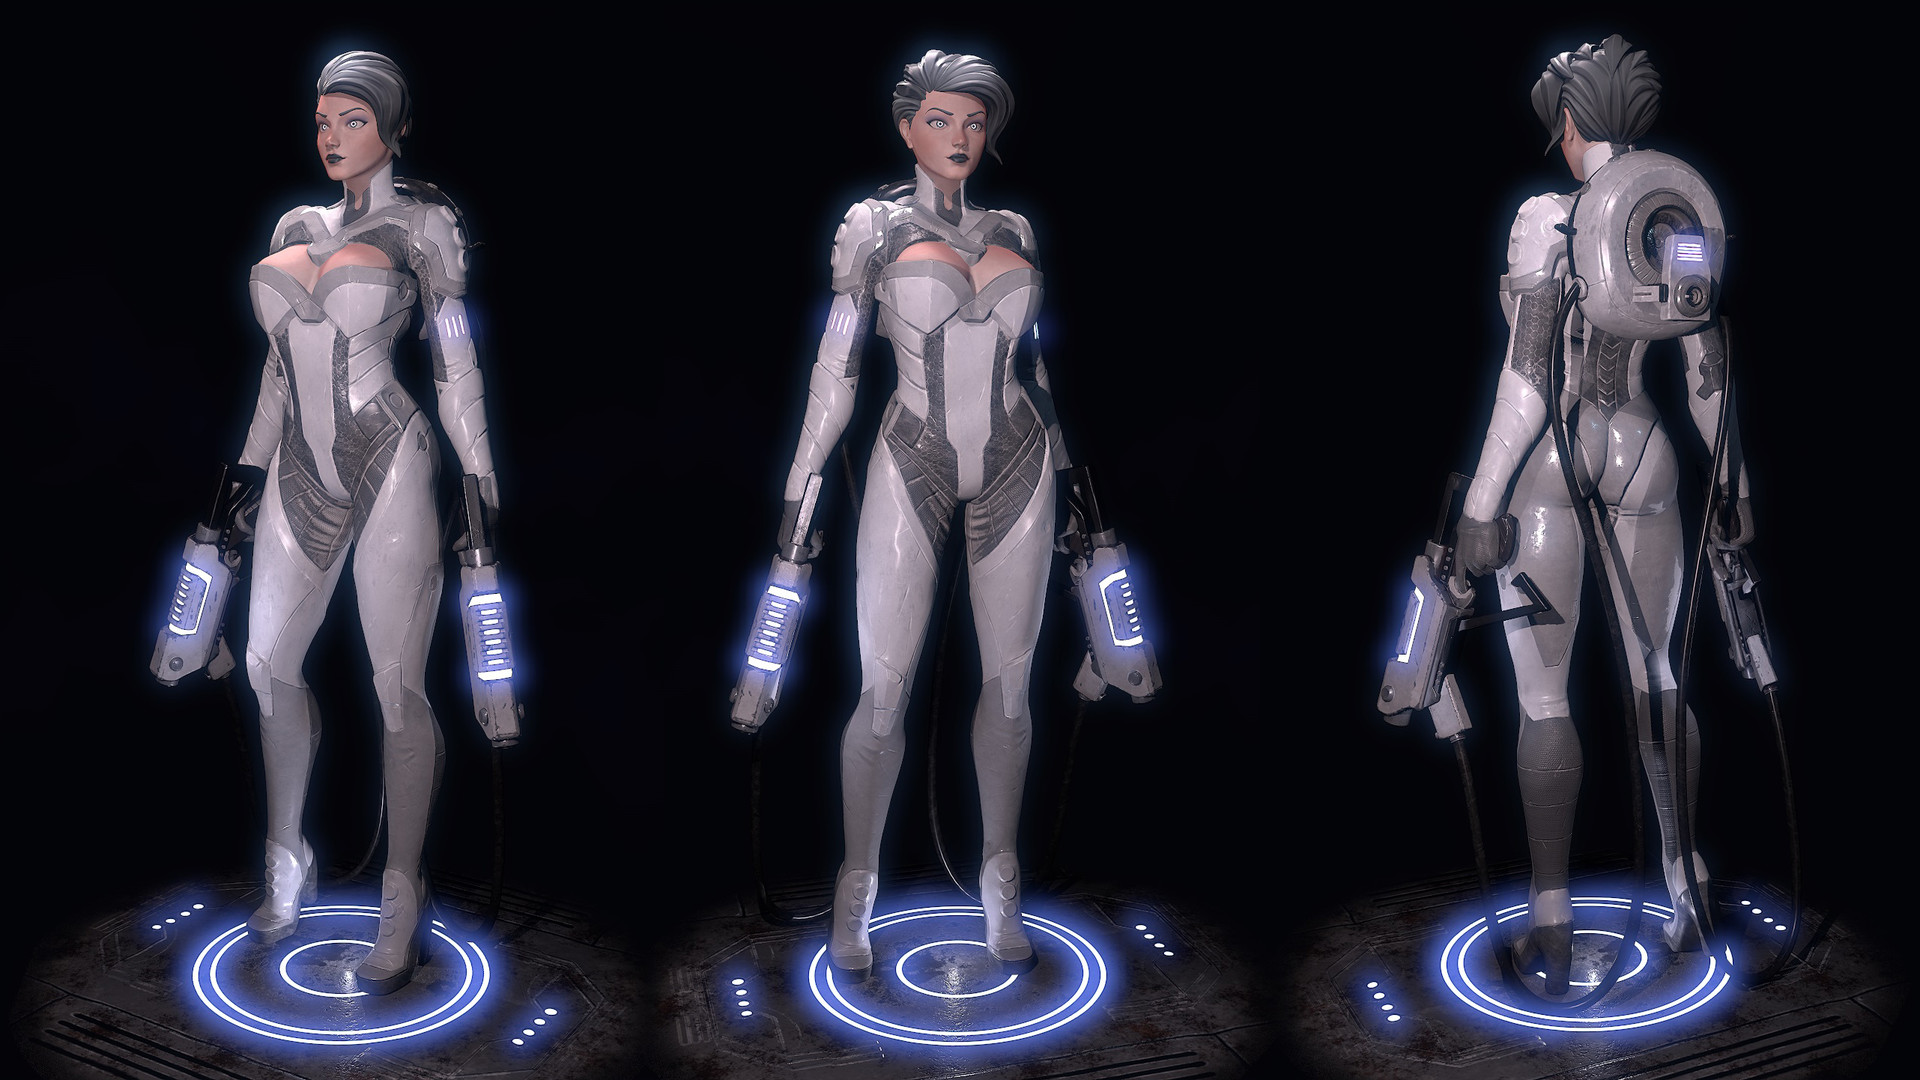 Eren ozel cinder scifi costume design 33 161206